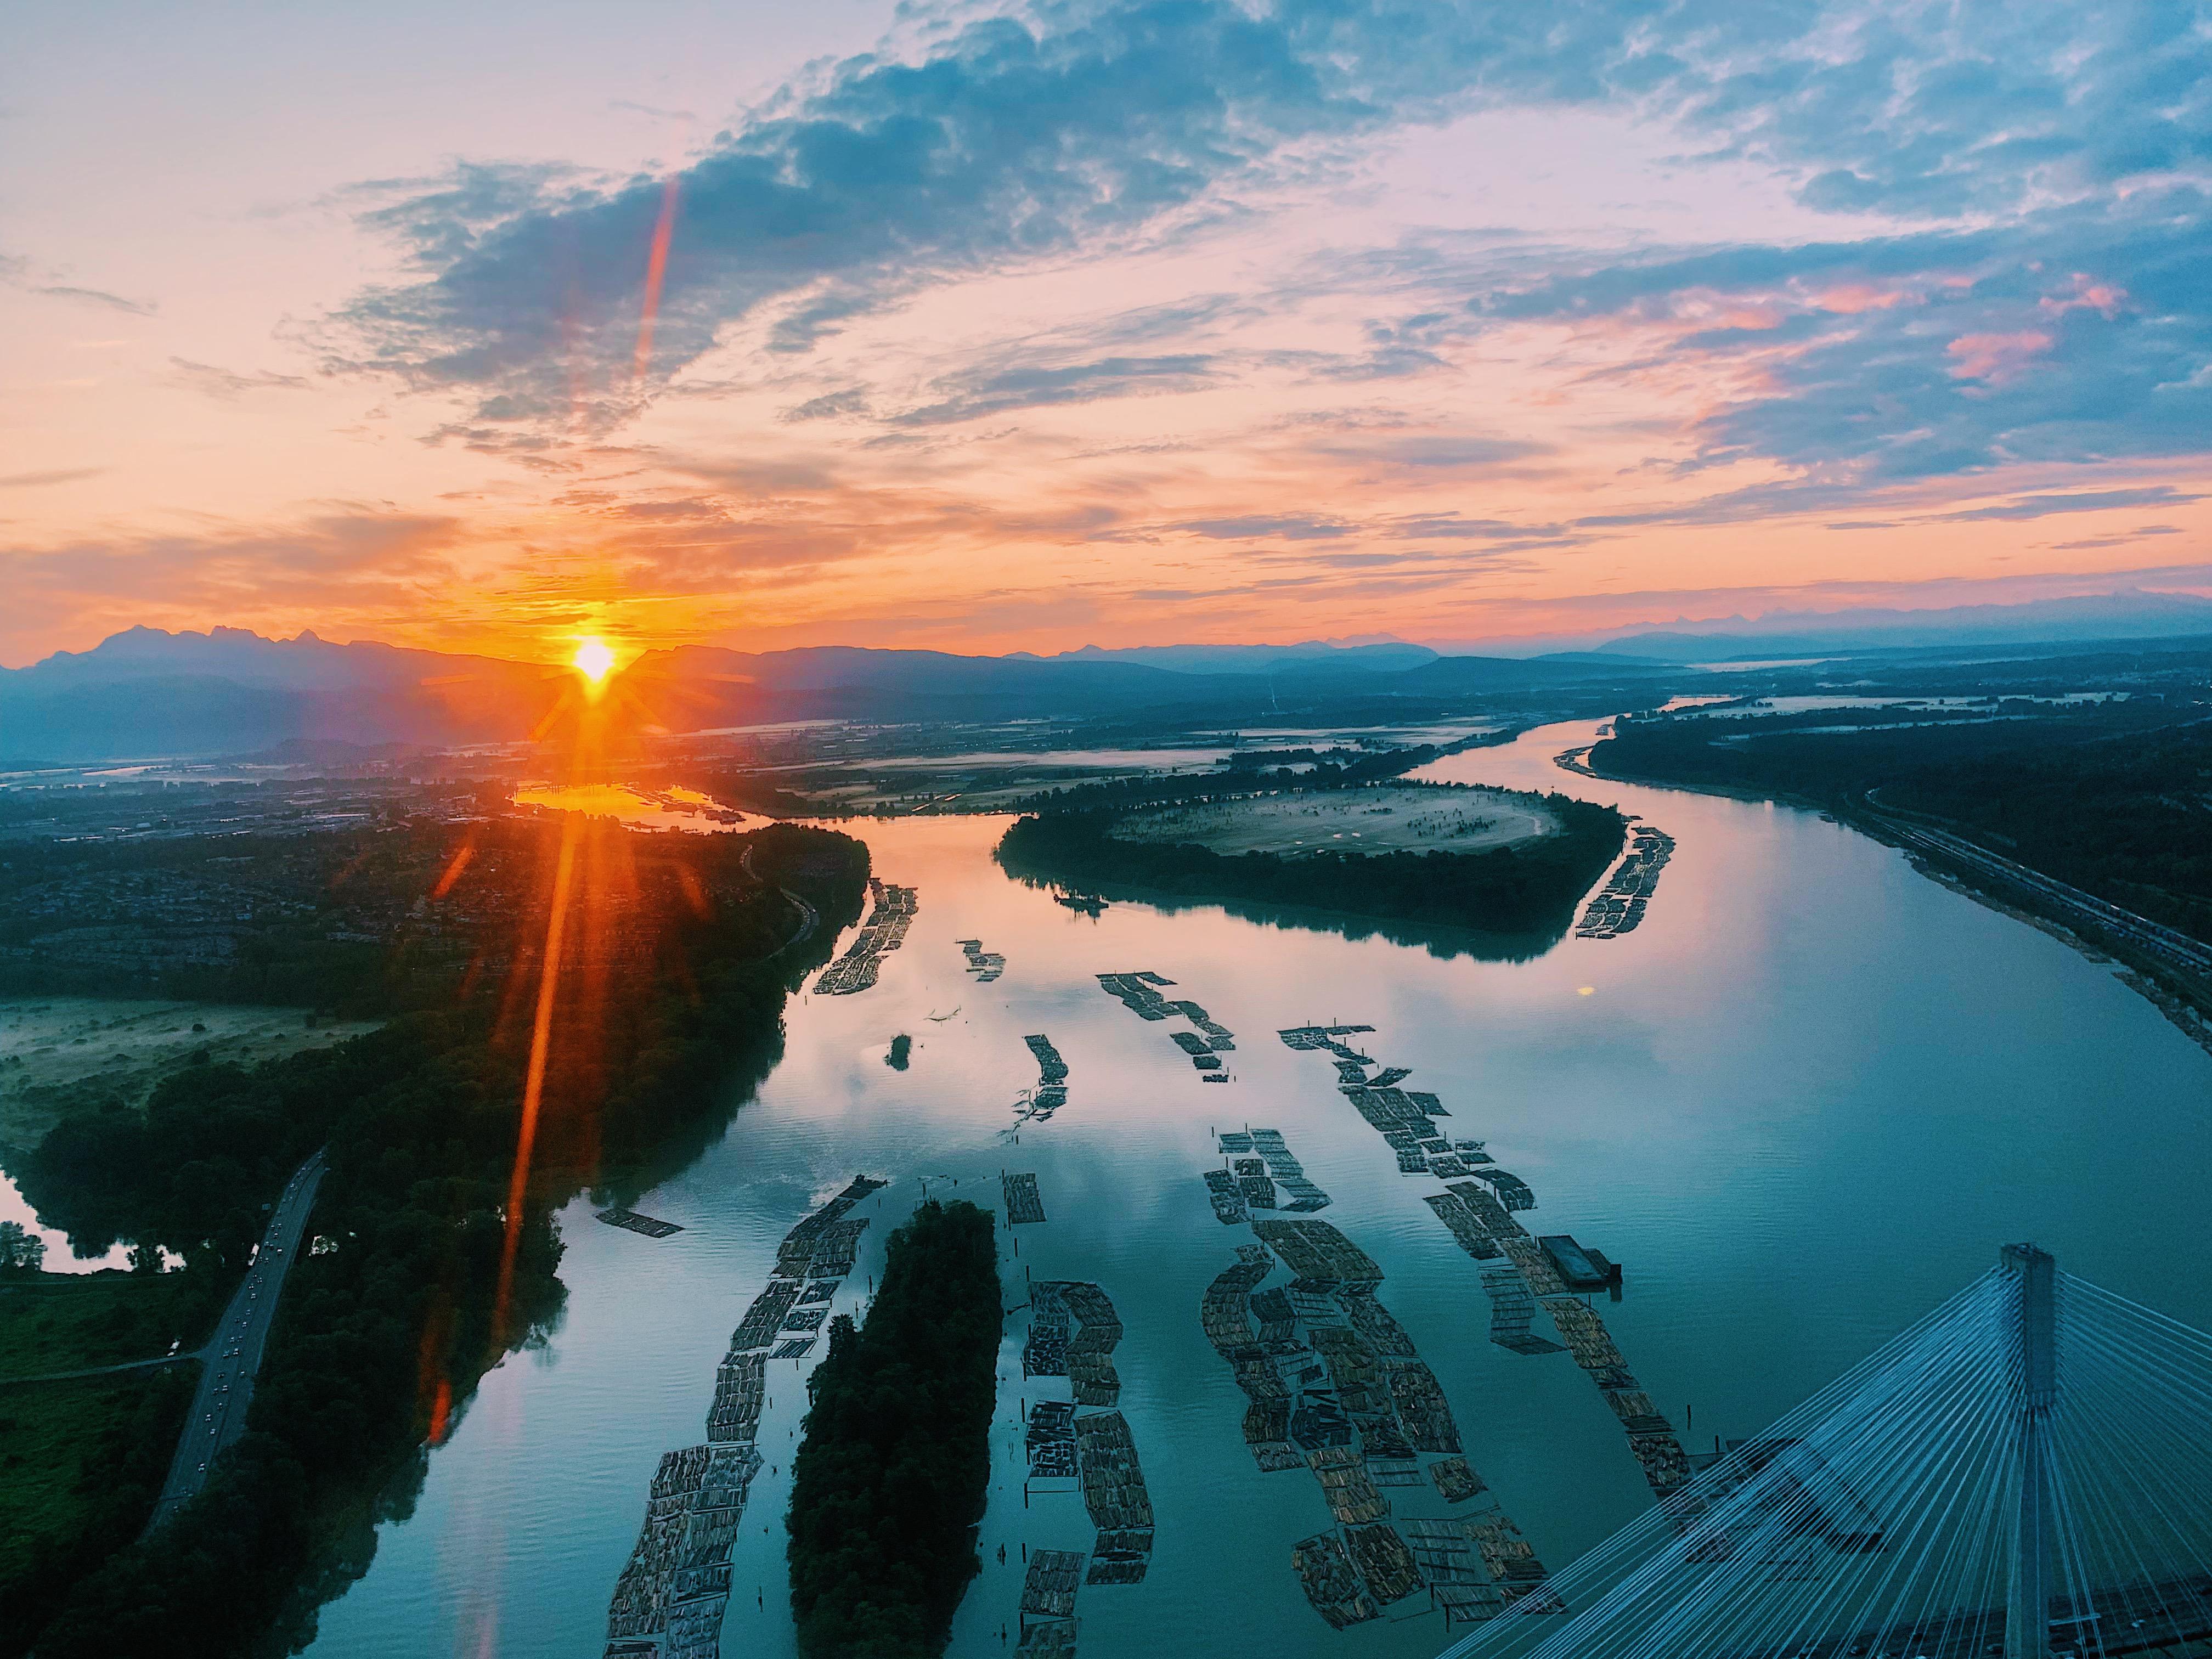 Langley Township bracing for peak of Fraser River - NEWS 1130